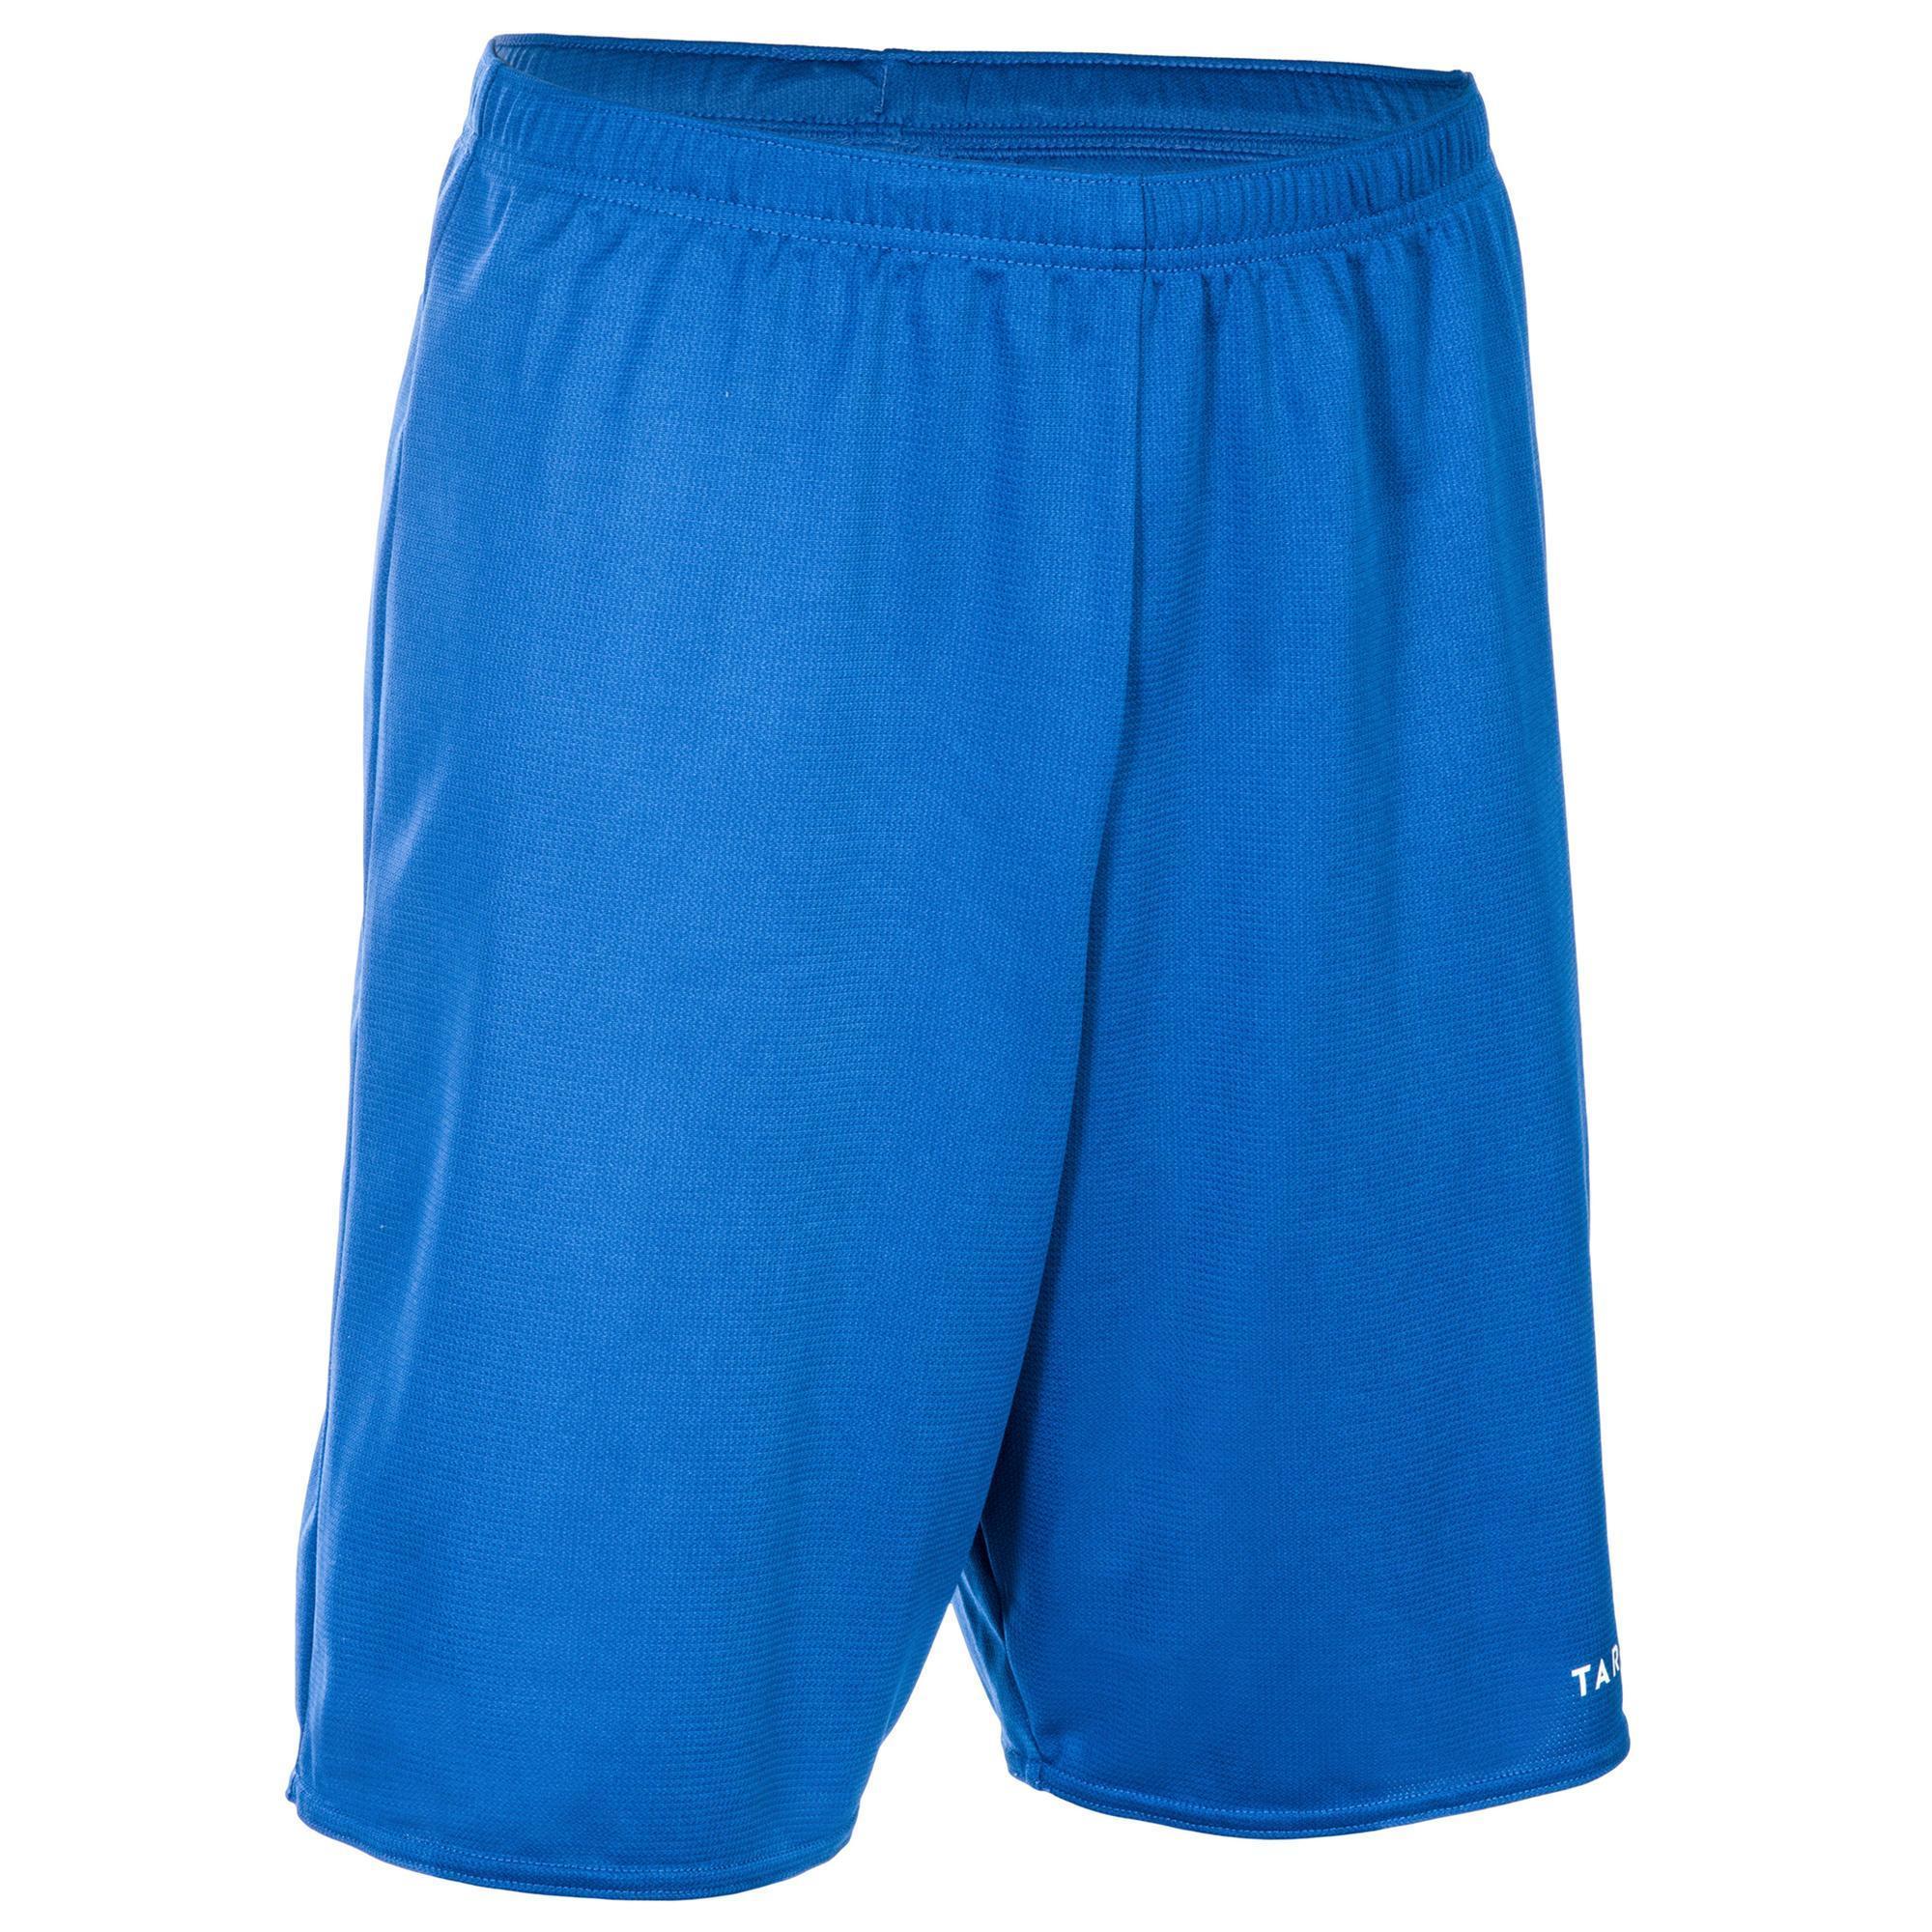 Tarmak Basketbalshort SH100 blauw